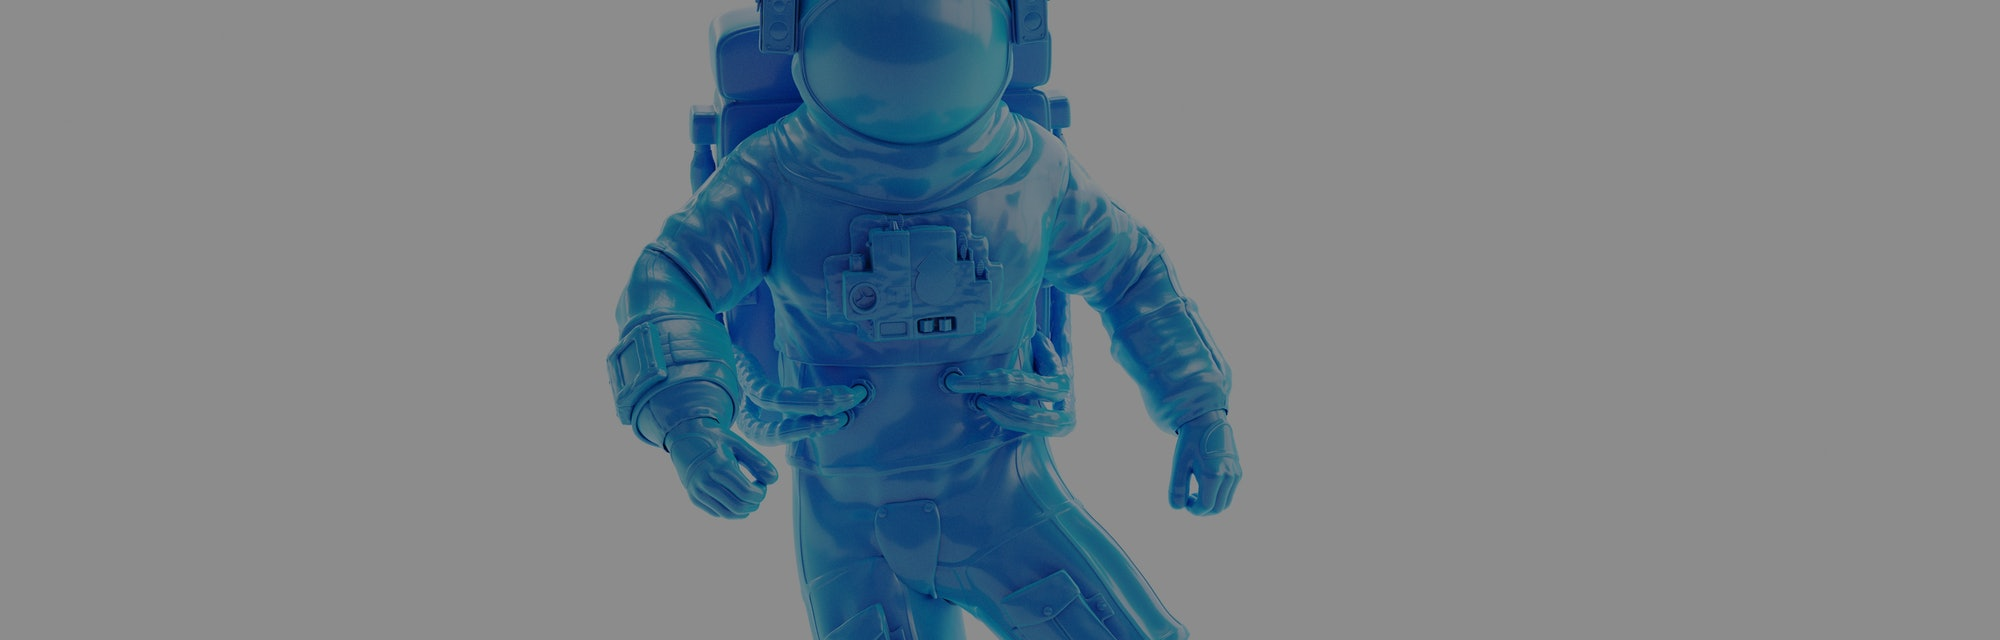 A plastic astronaut